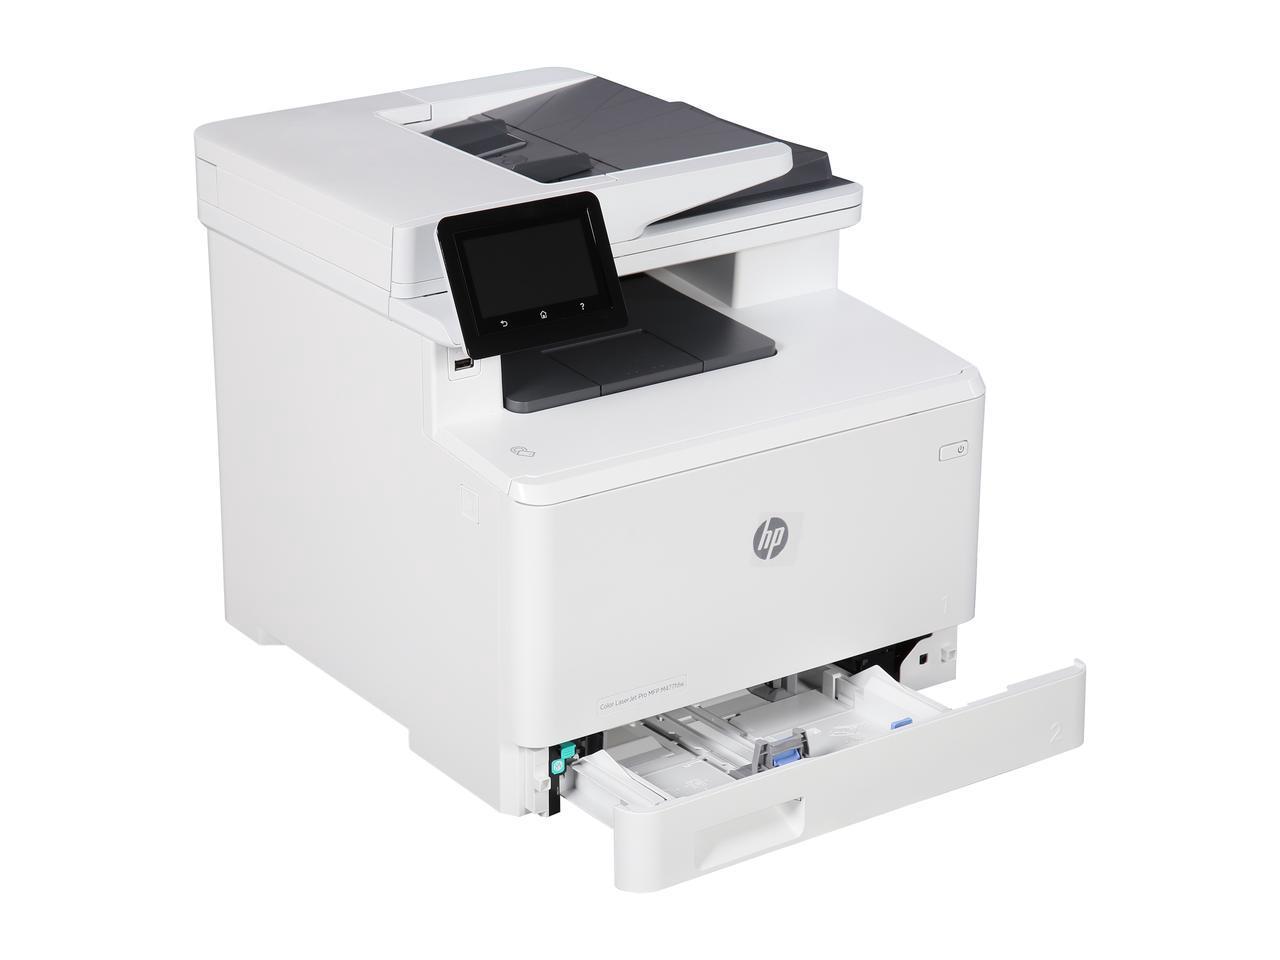 Hp Color Laserjet Pro Mfp M477fdw Help Tech Co Ltd